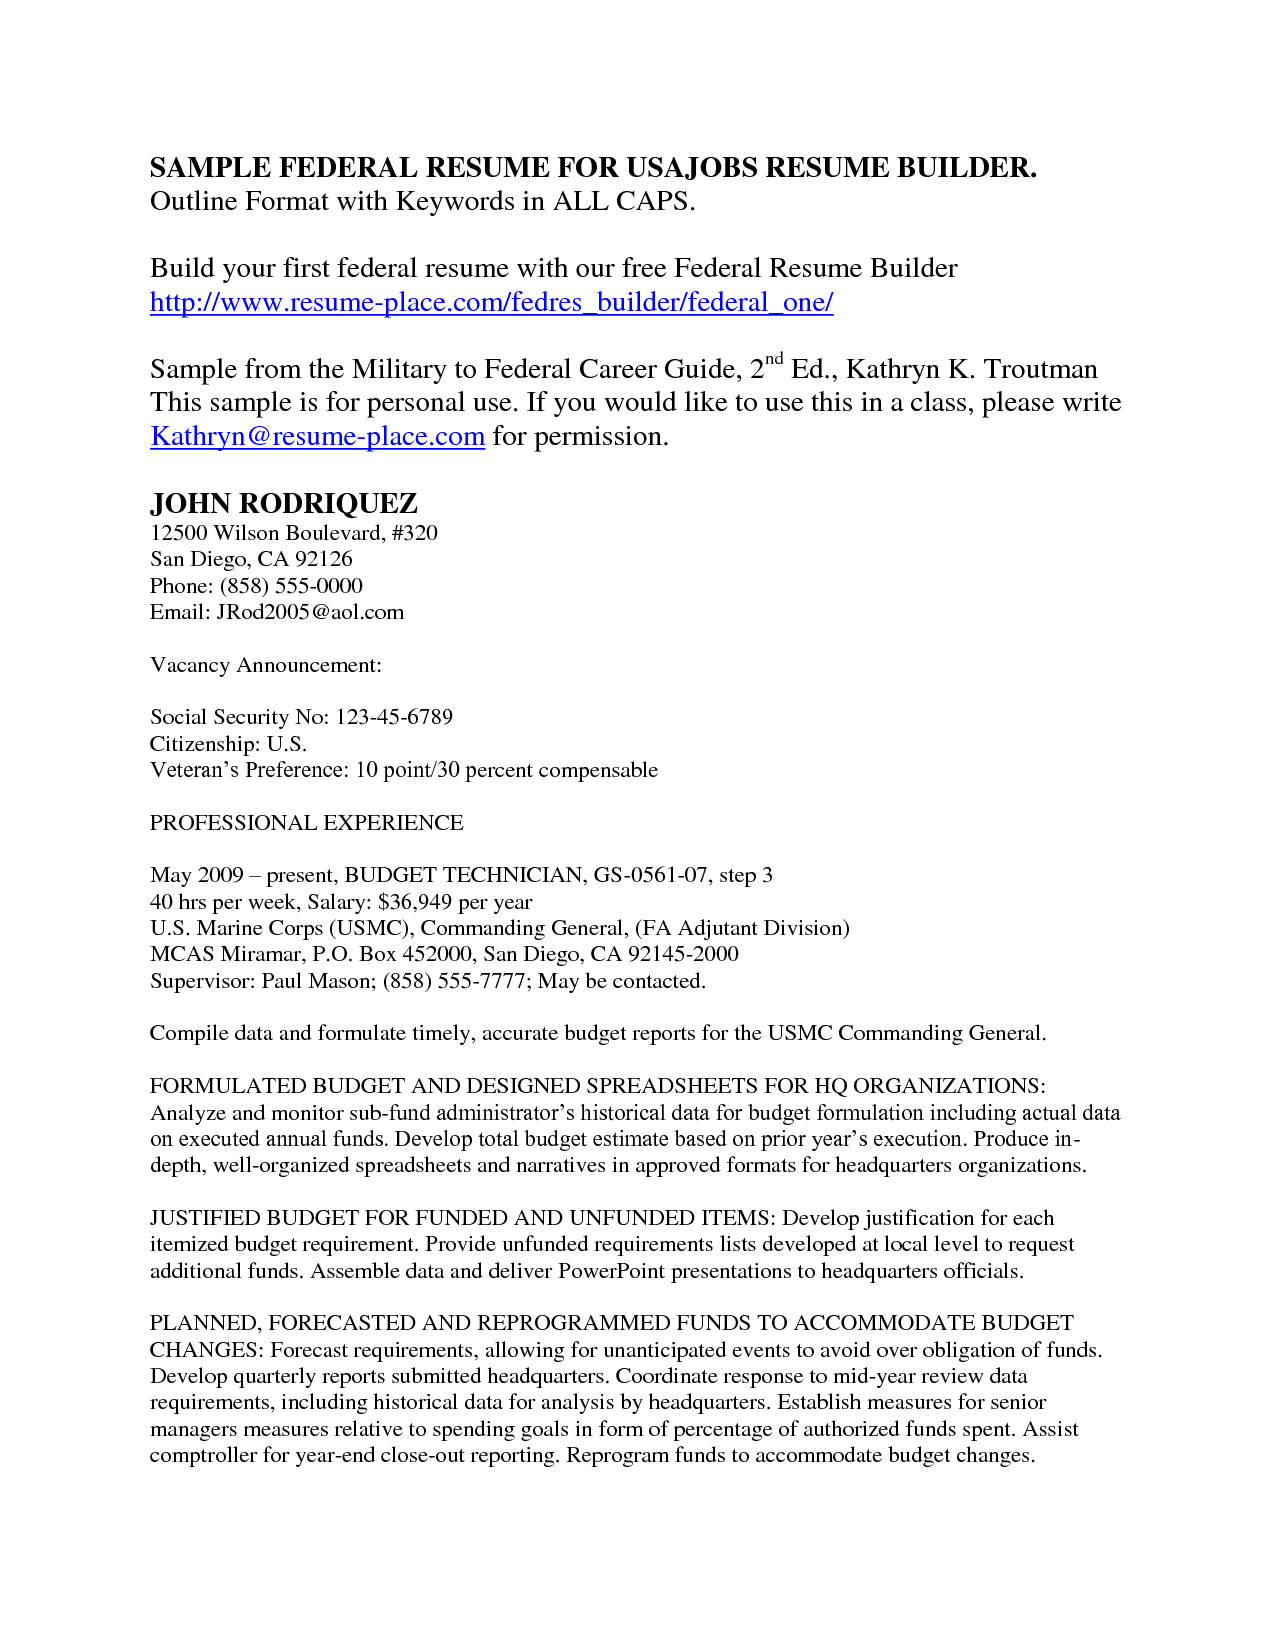 Job Resume Usa - Resume Examples   Resume Template